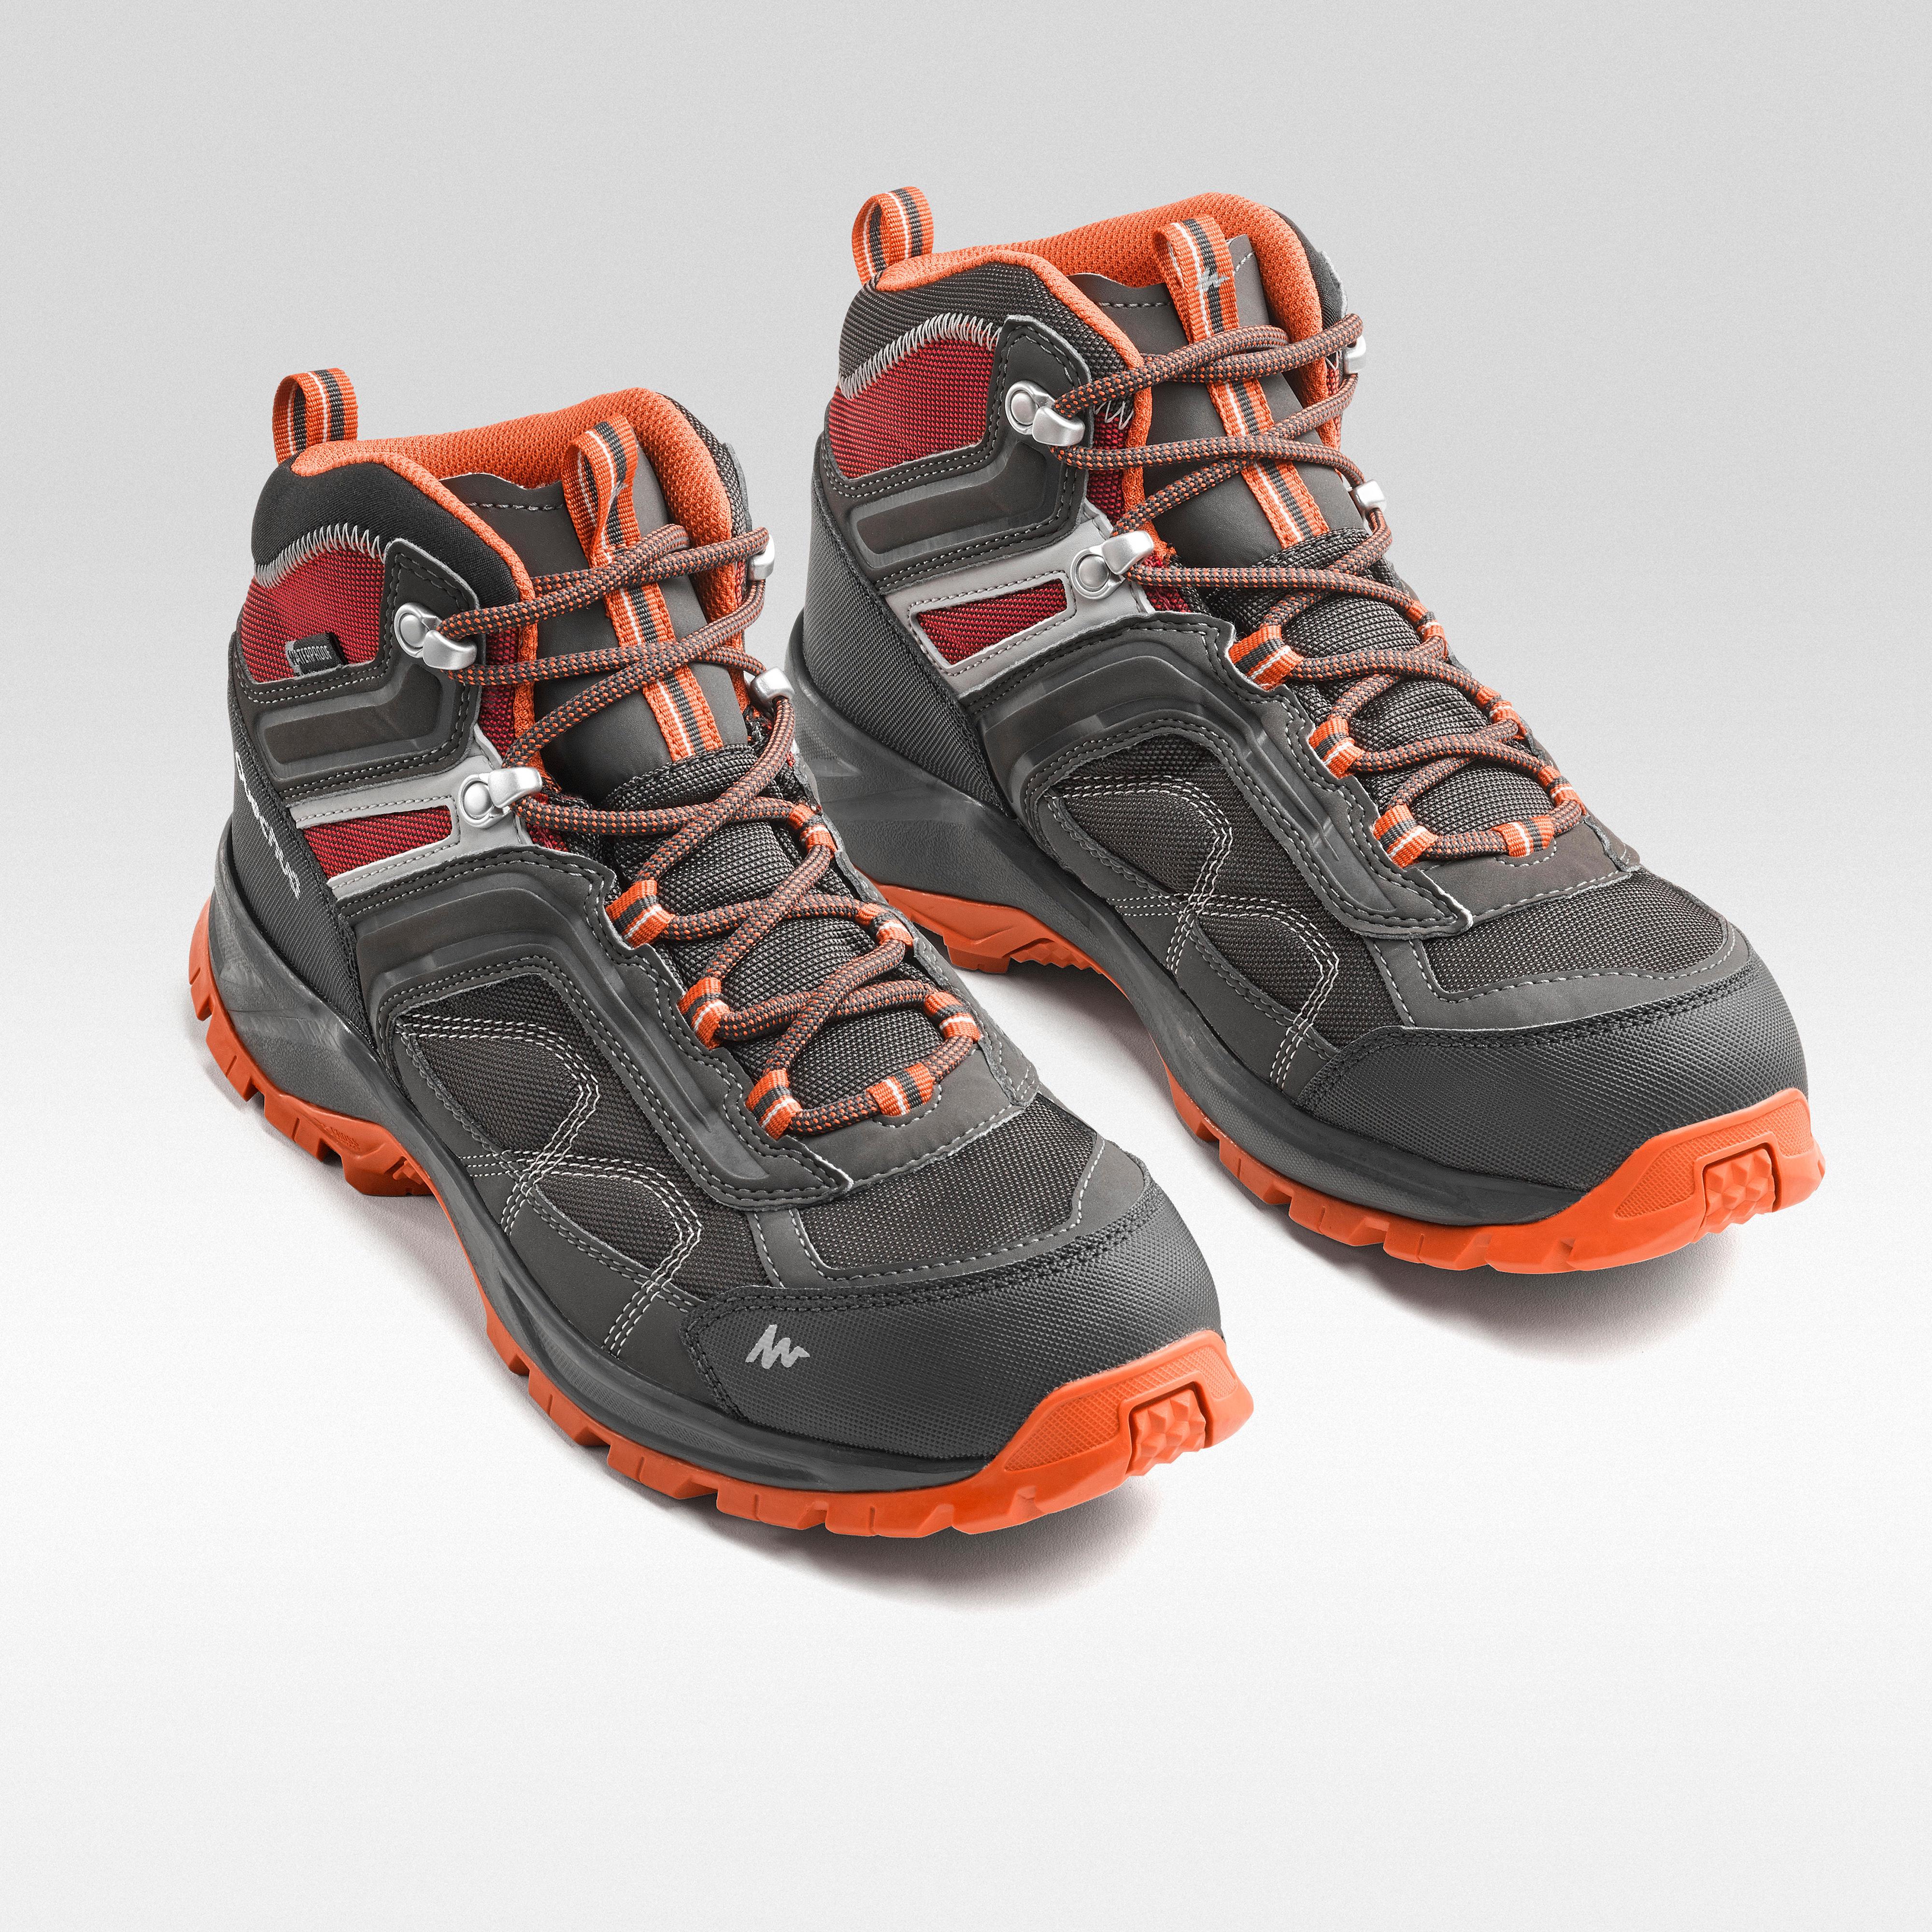 Men's Hiking Shoes MH100 (Waterproof) - Grey Orange